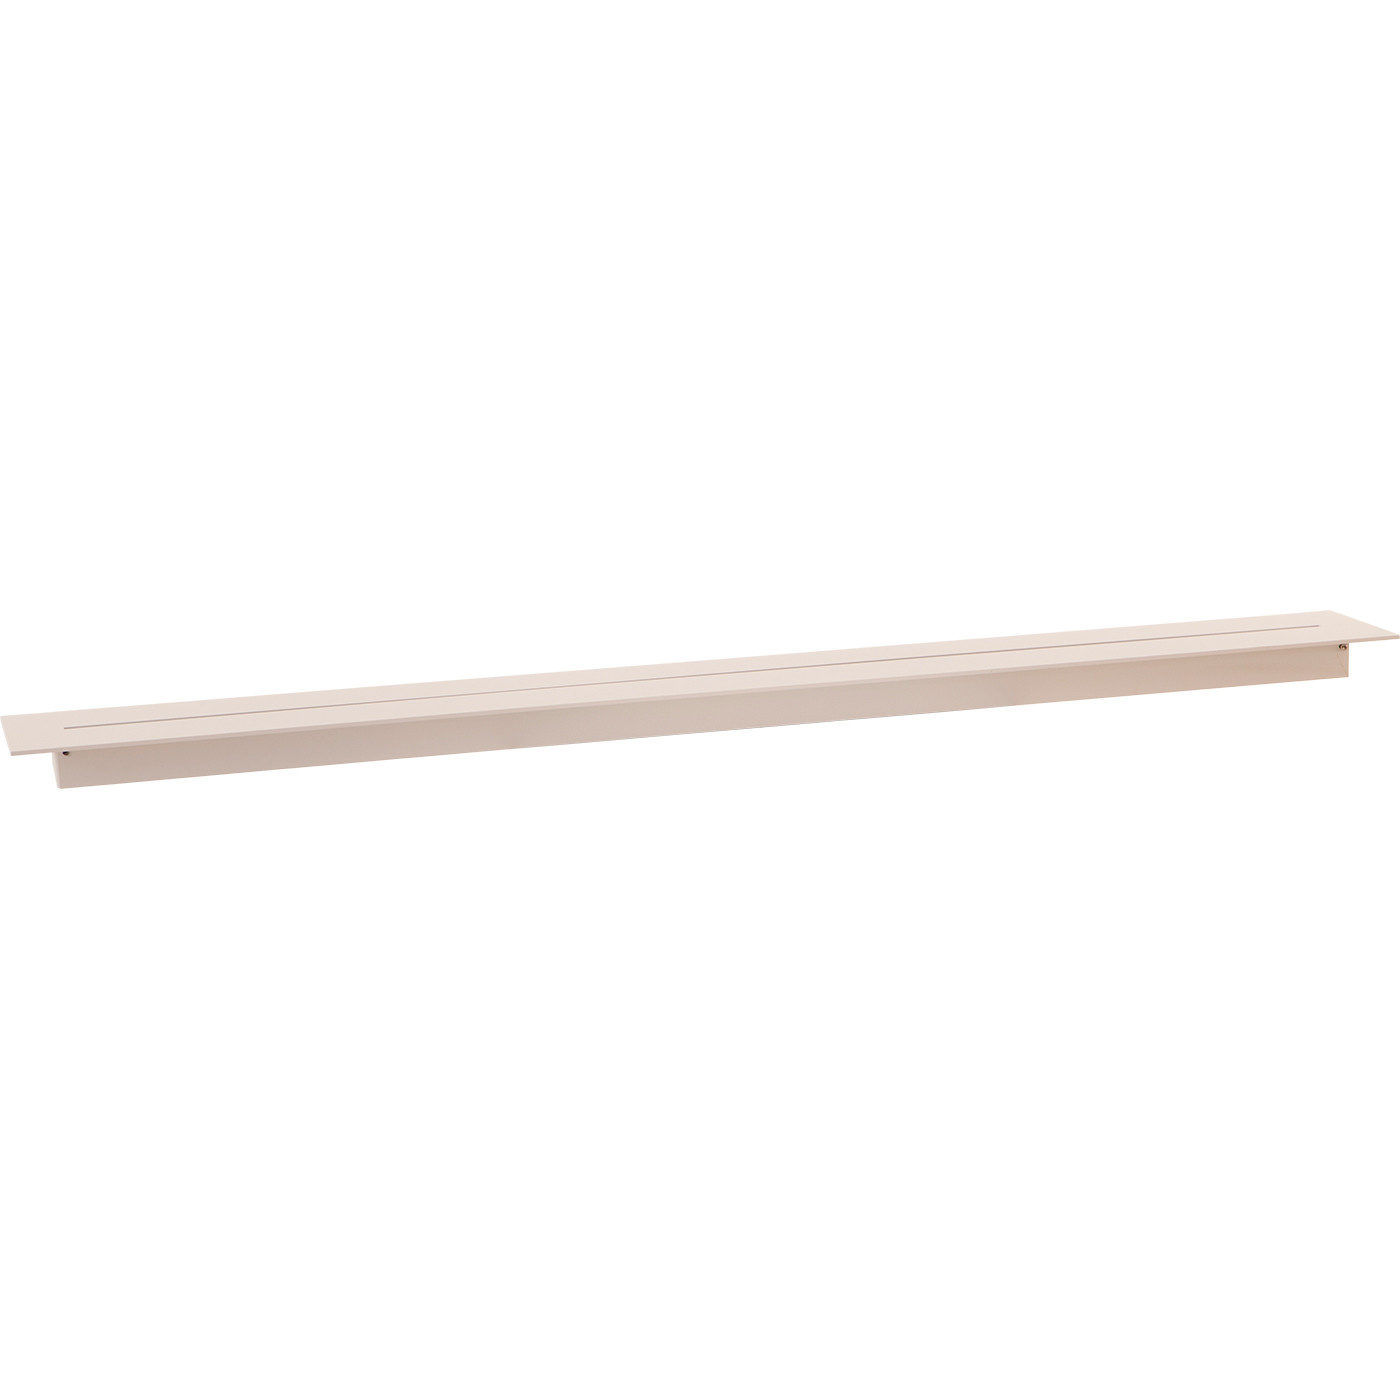 Foscarini Mehrfach-Deckenbaldachin linear Länge 135 cm